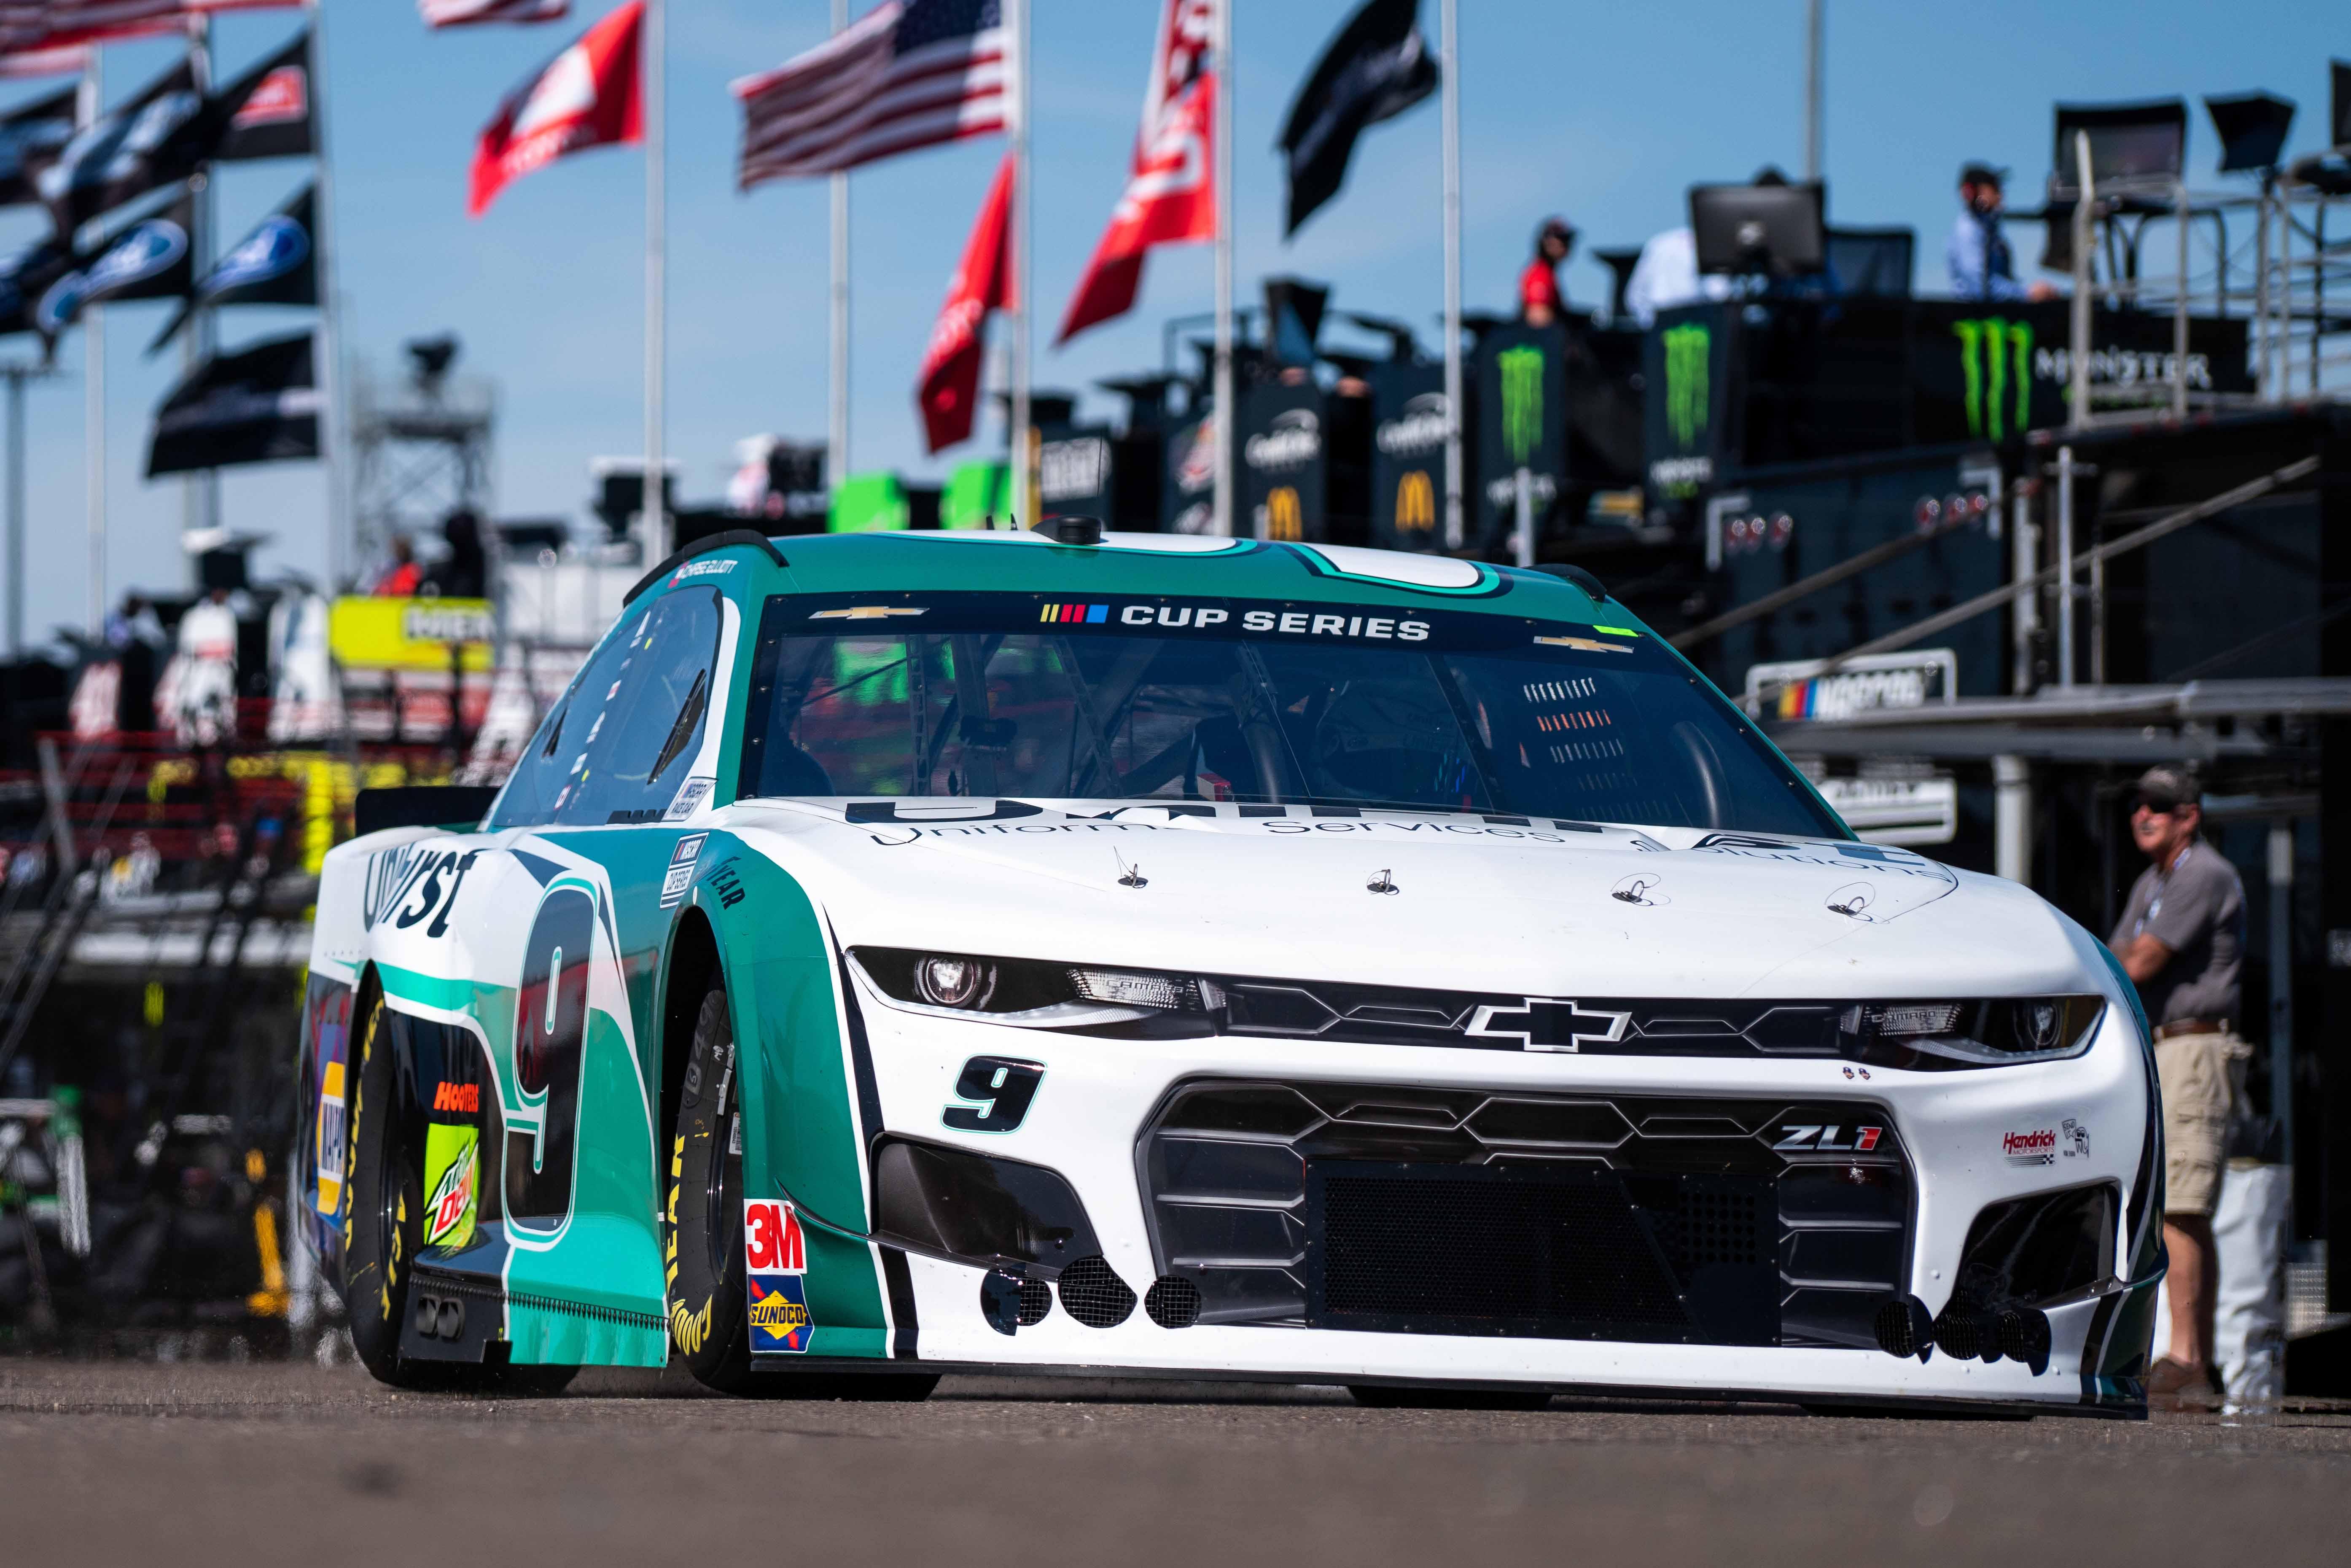 Chase Elliott at Phoenix Raceway - NASCAR Cup Series garage